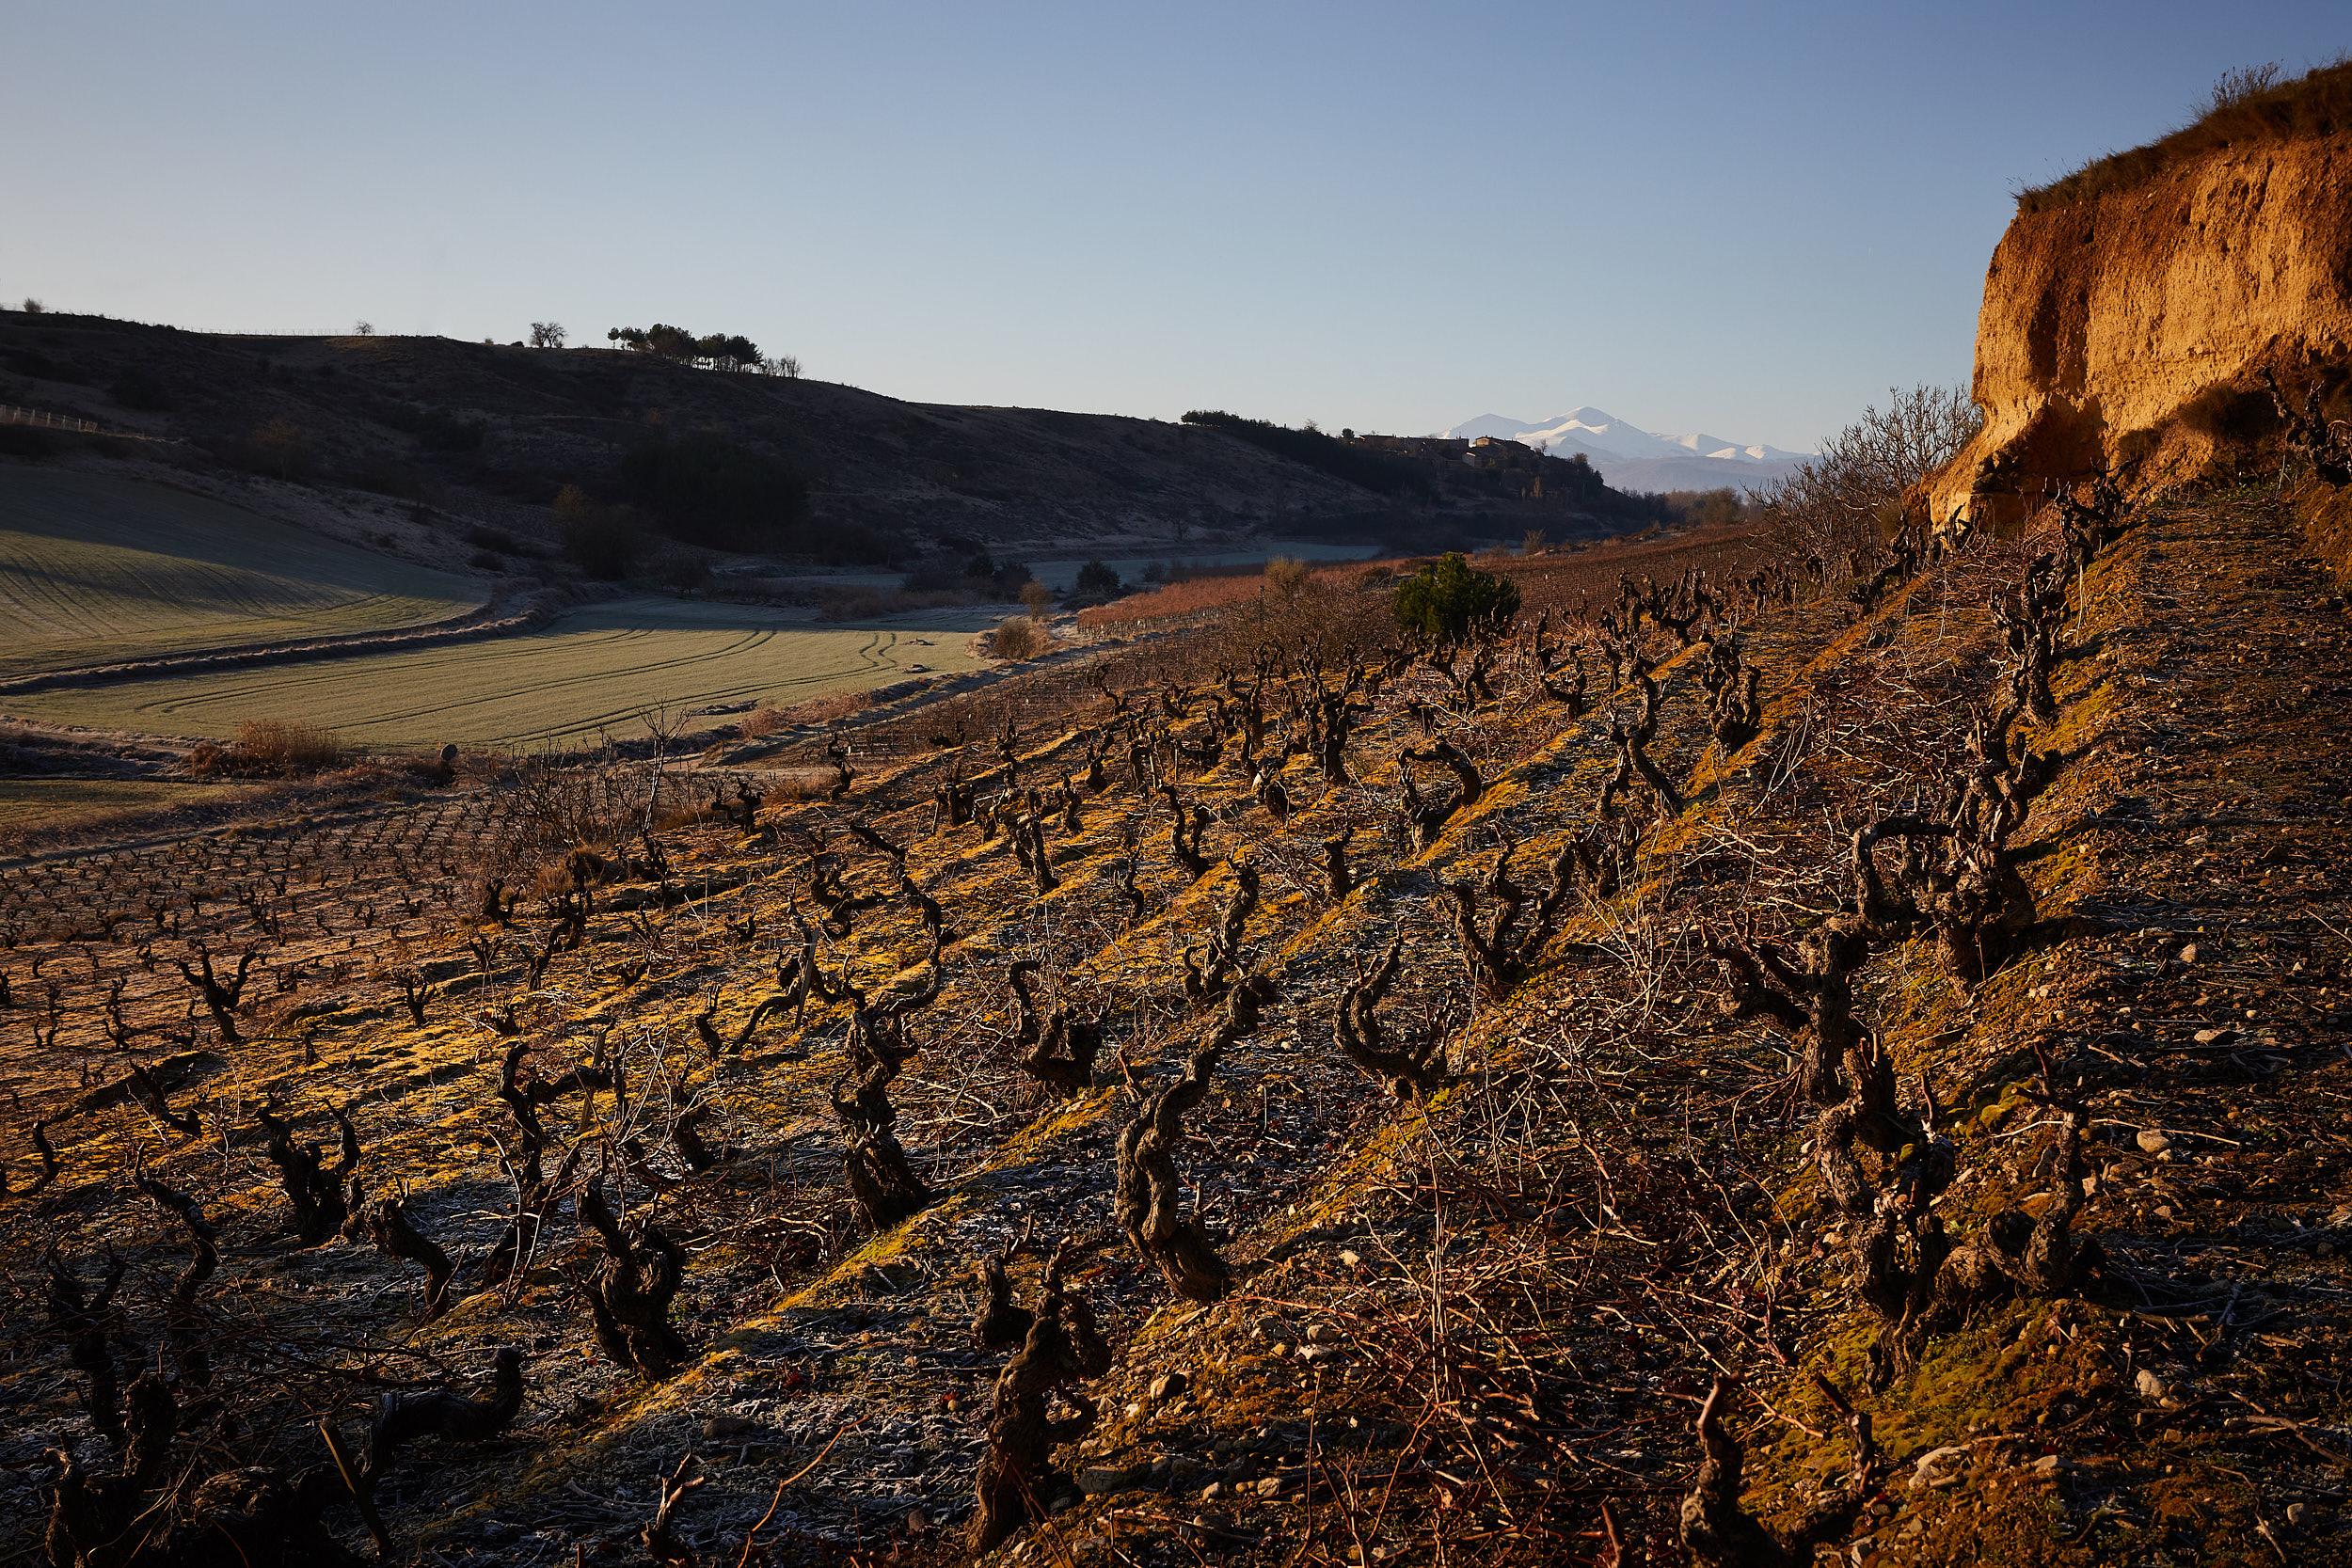 31/1/18  Gómez Cruzado vineyard in Ollauri, La Rioja, Spain. Photo by James Sturcke | sturcke.org